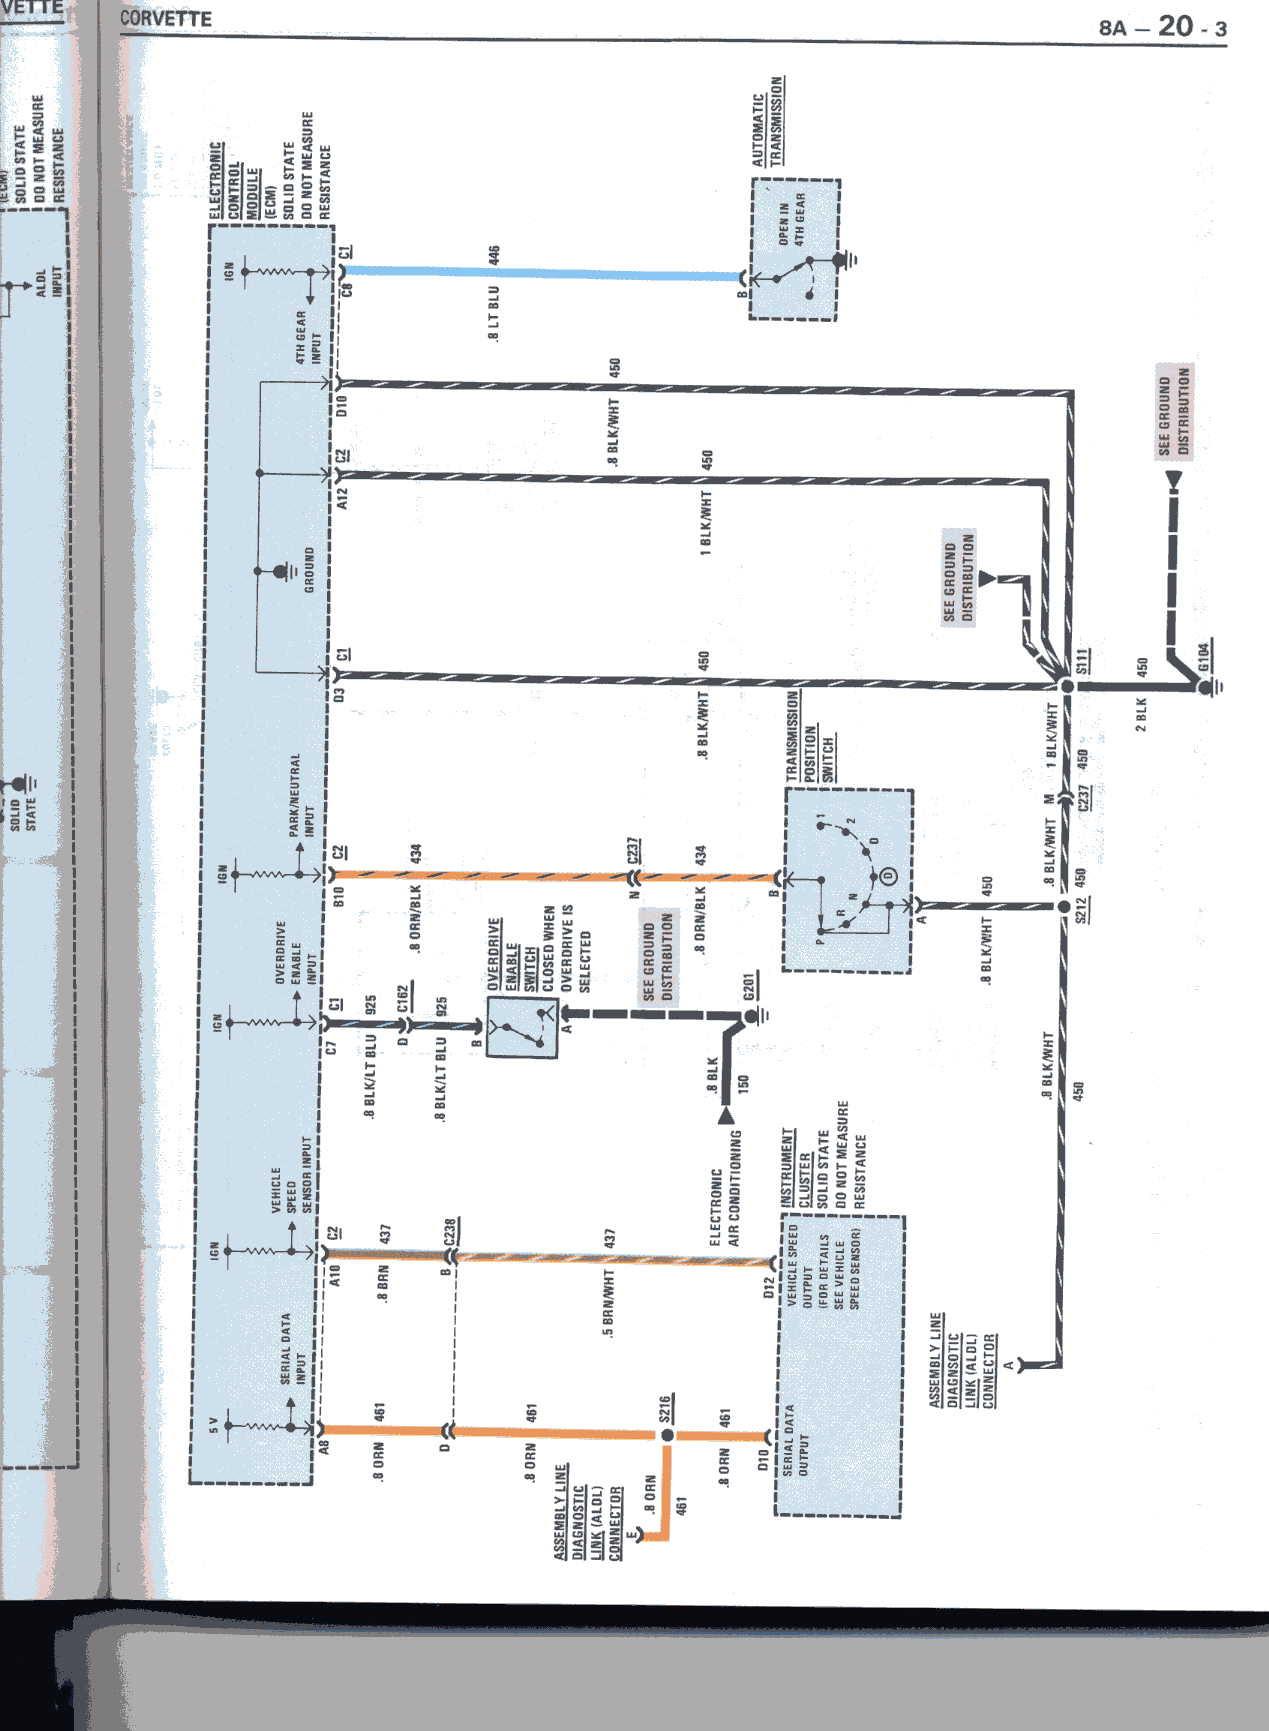 I Need A Wiring Diagram Schematic For 1988 Computer Corvetteforum Chevrolet Corvette Forum Discussion